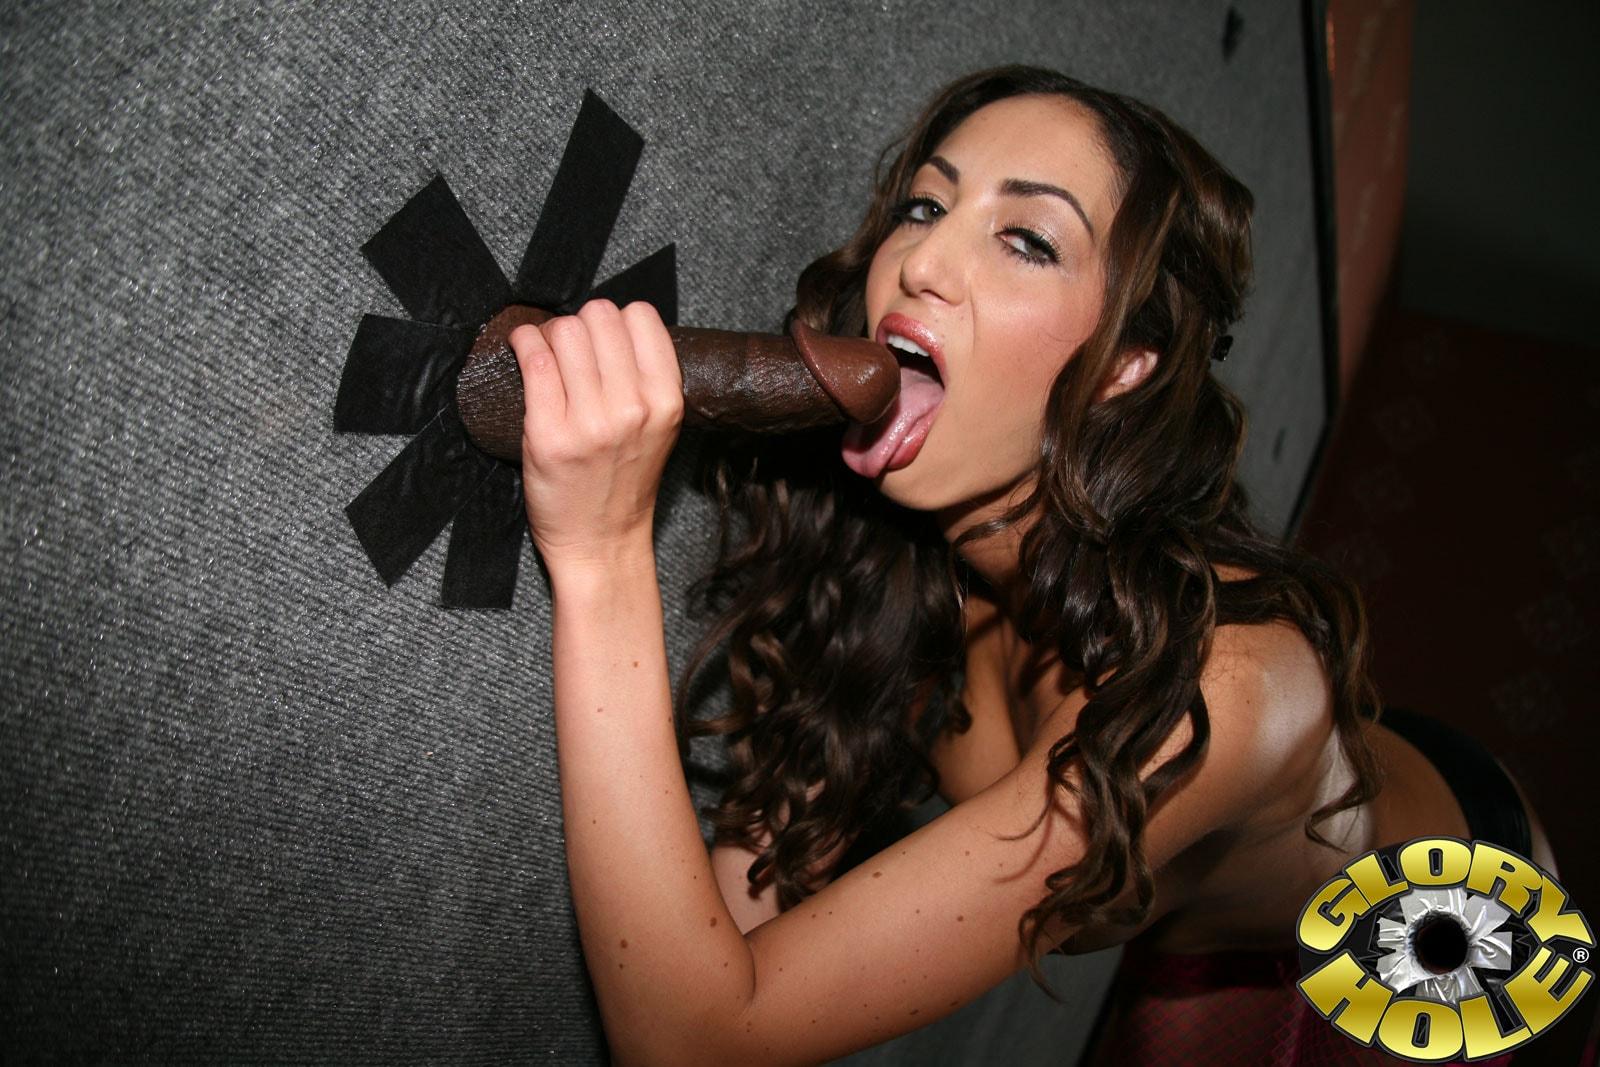 Angelica sage fucks black cock - gloryhole